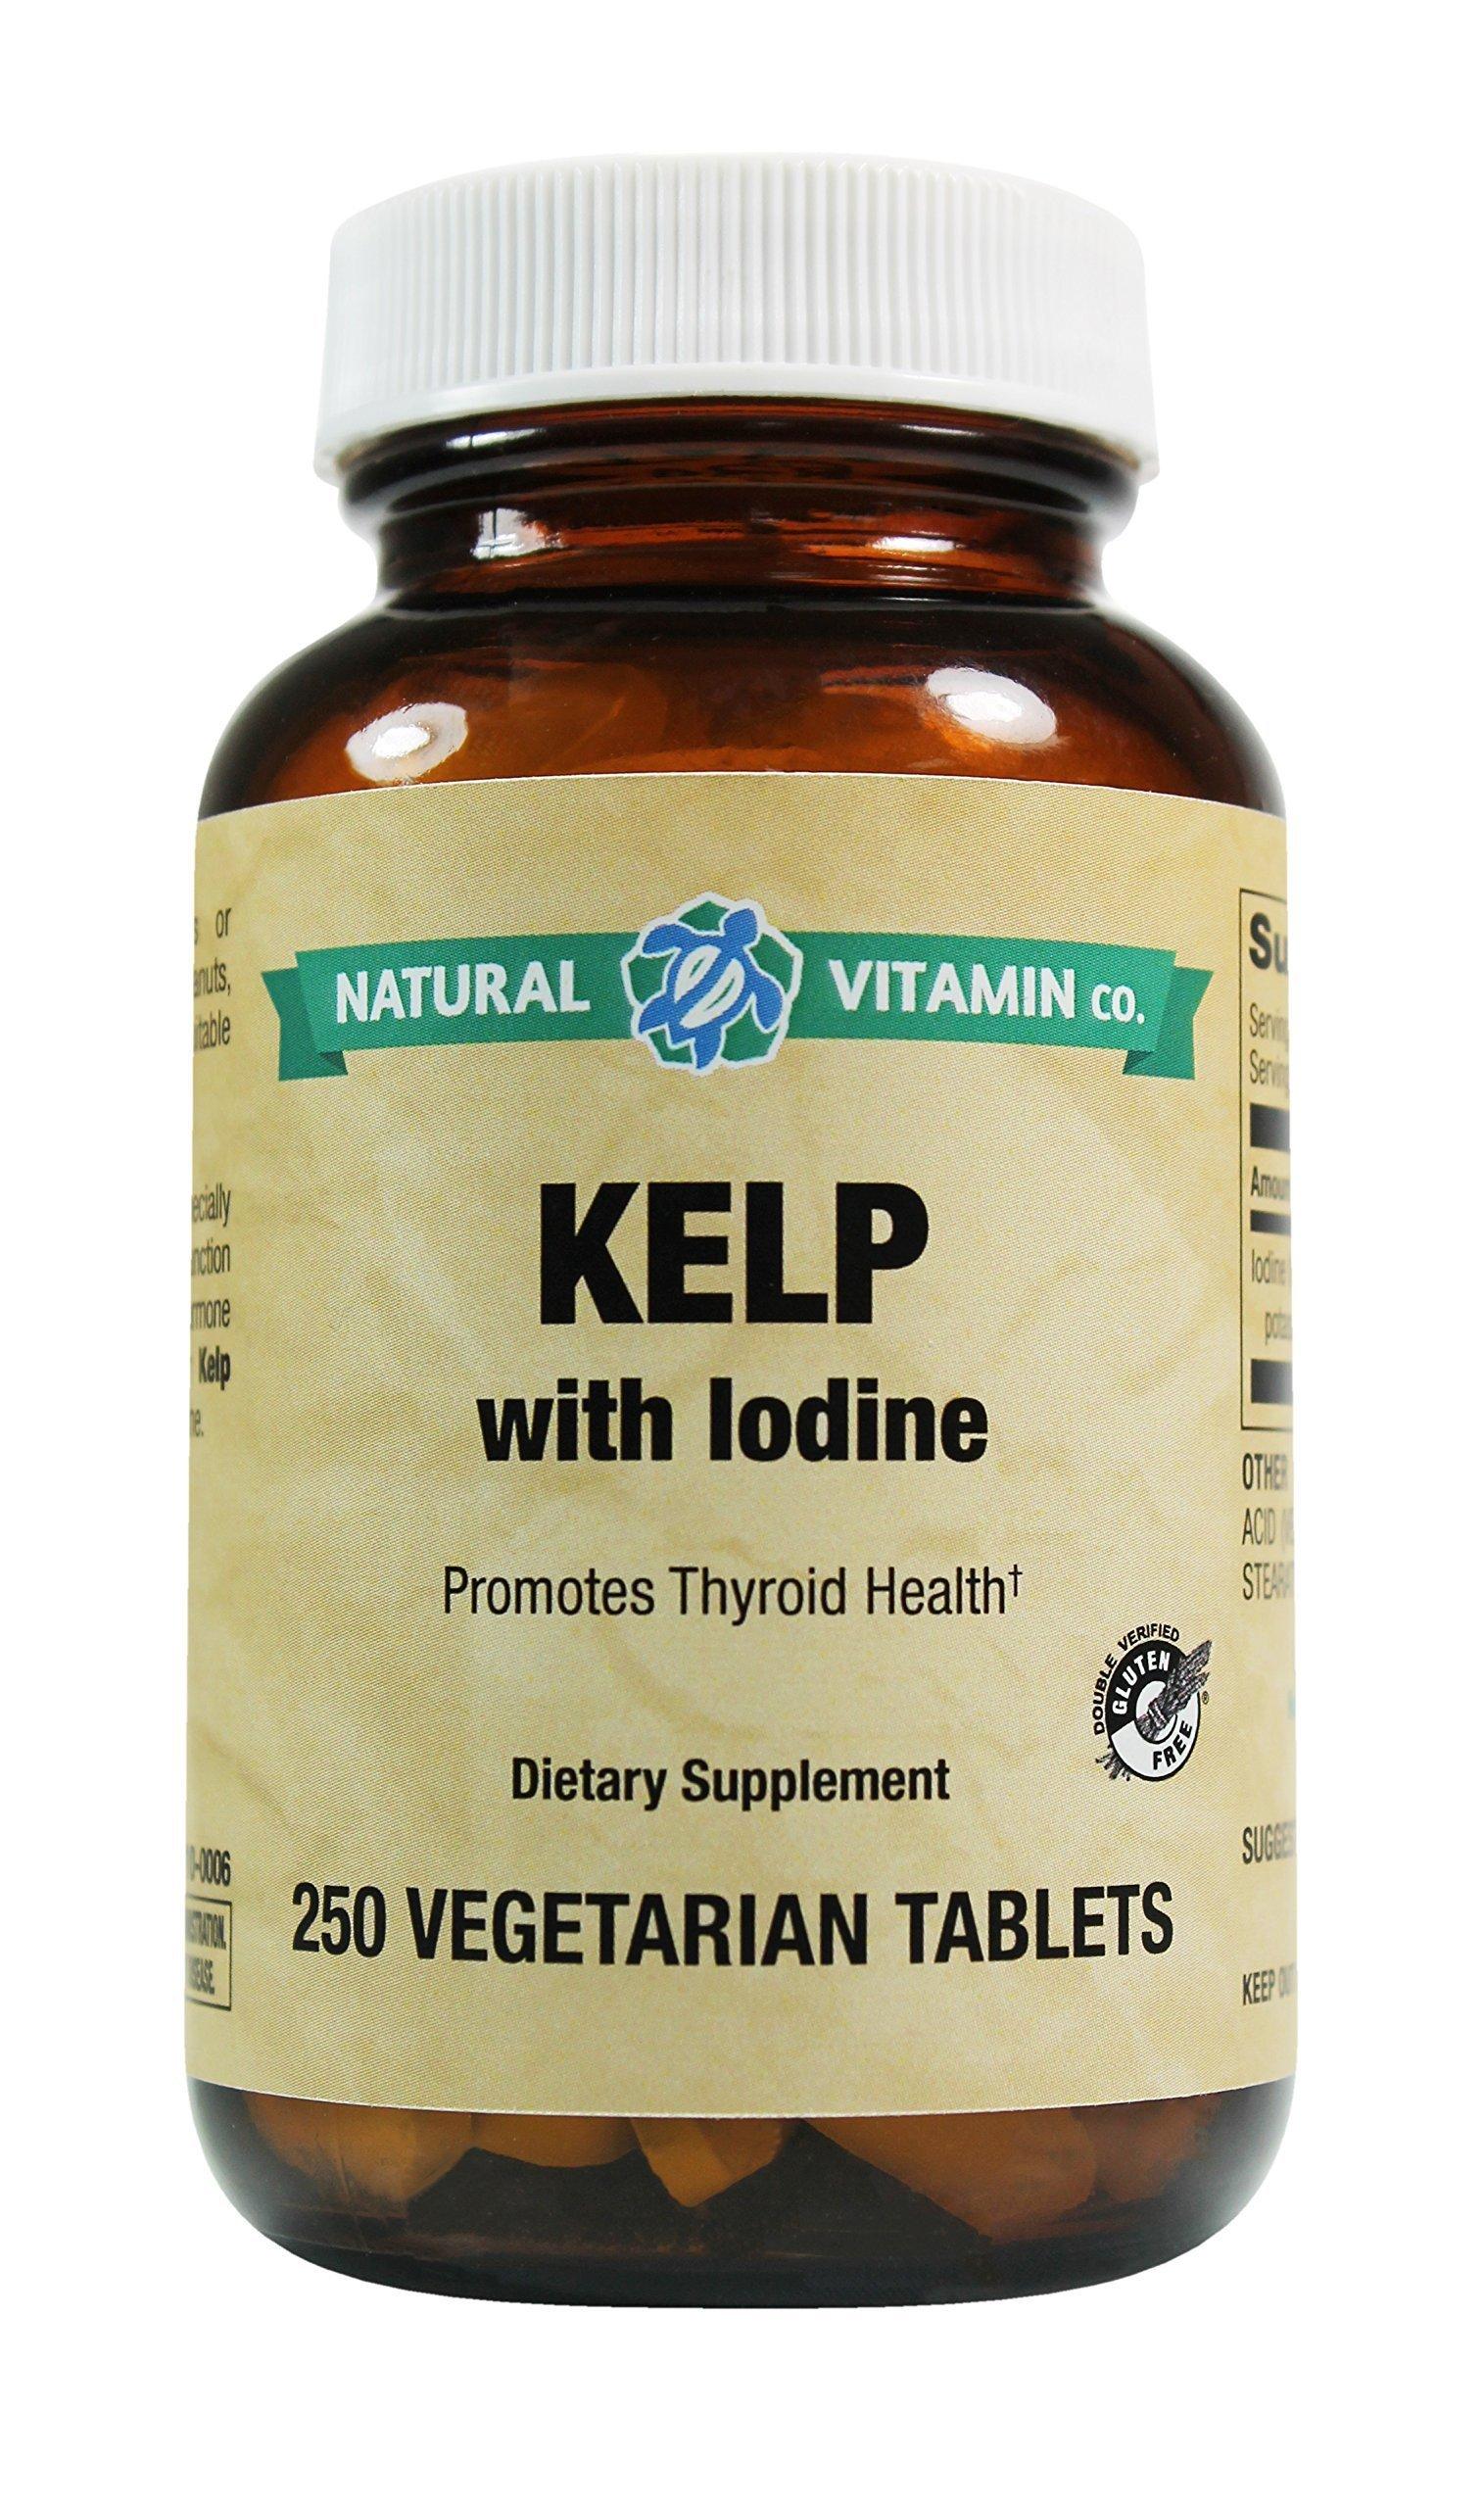 Natural Vitamin Co. Kelp with Iodine 225mcg, Gluten Free Vegetarian Vegan Tablets (250)